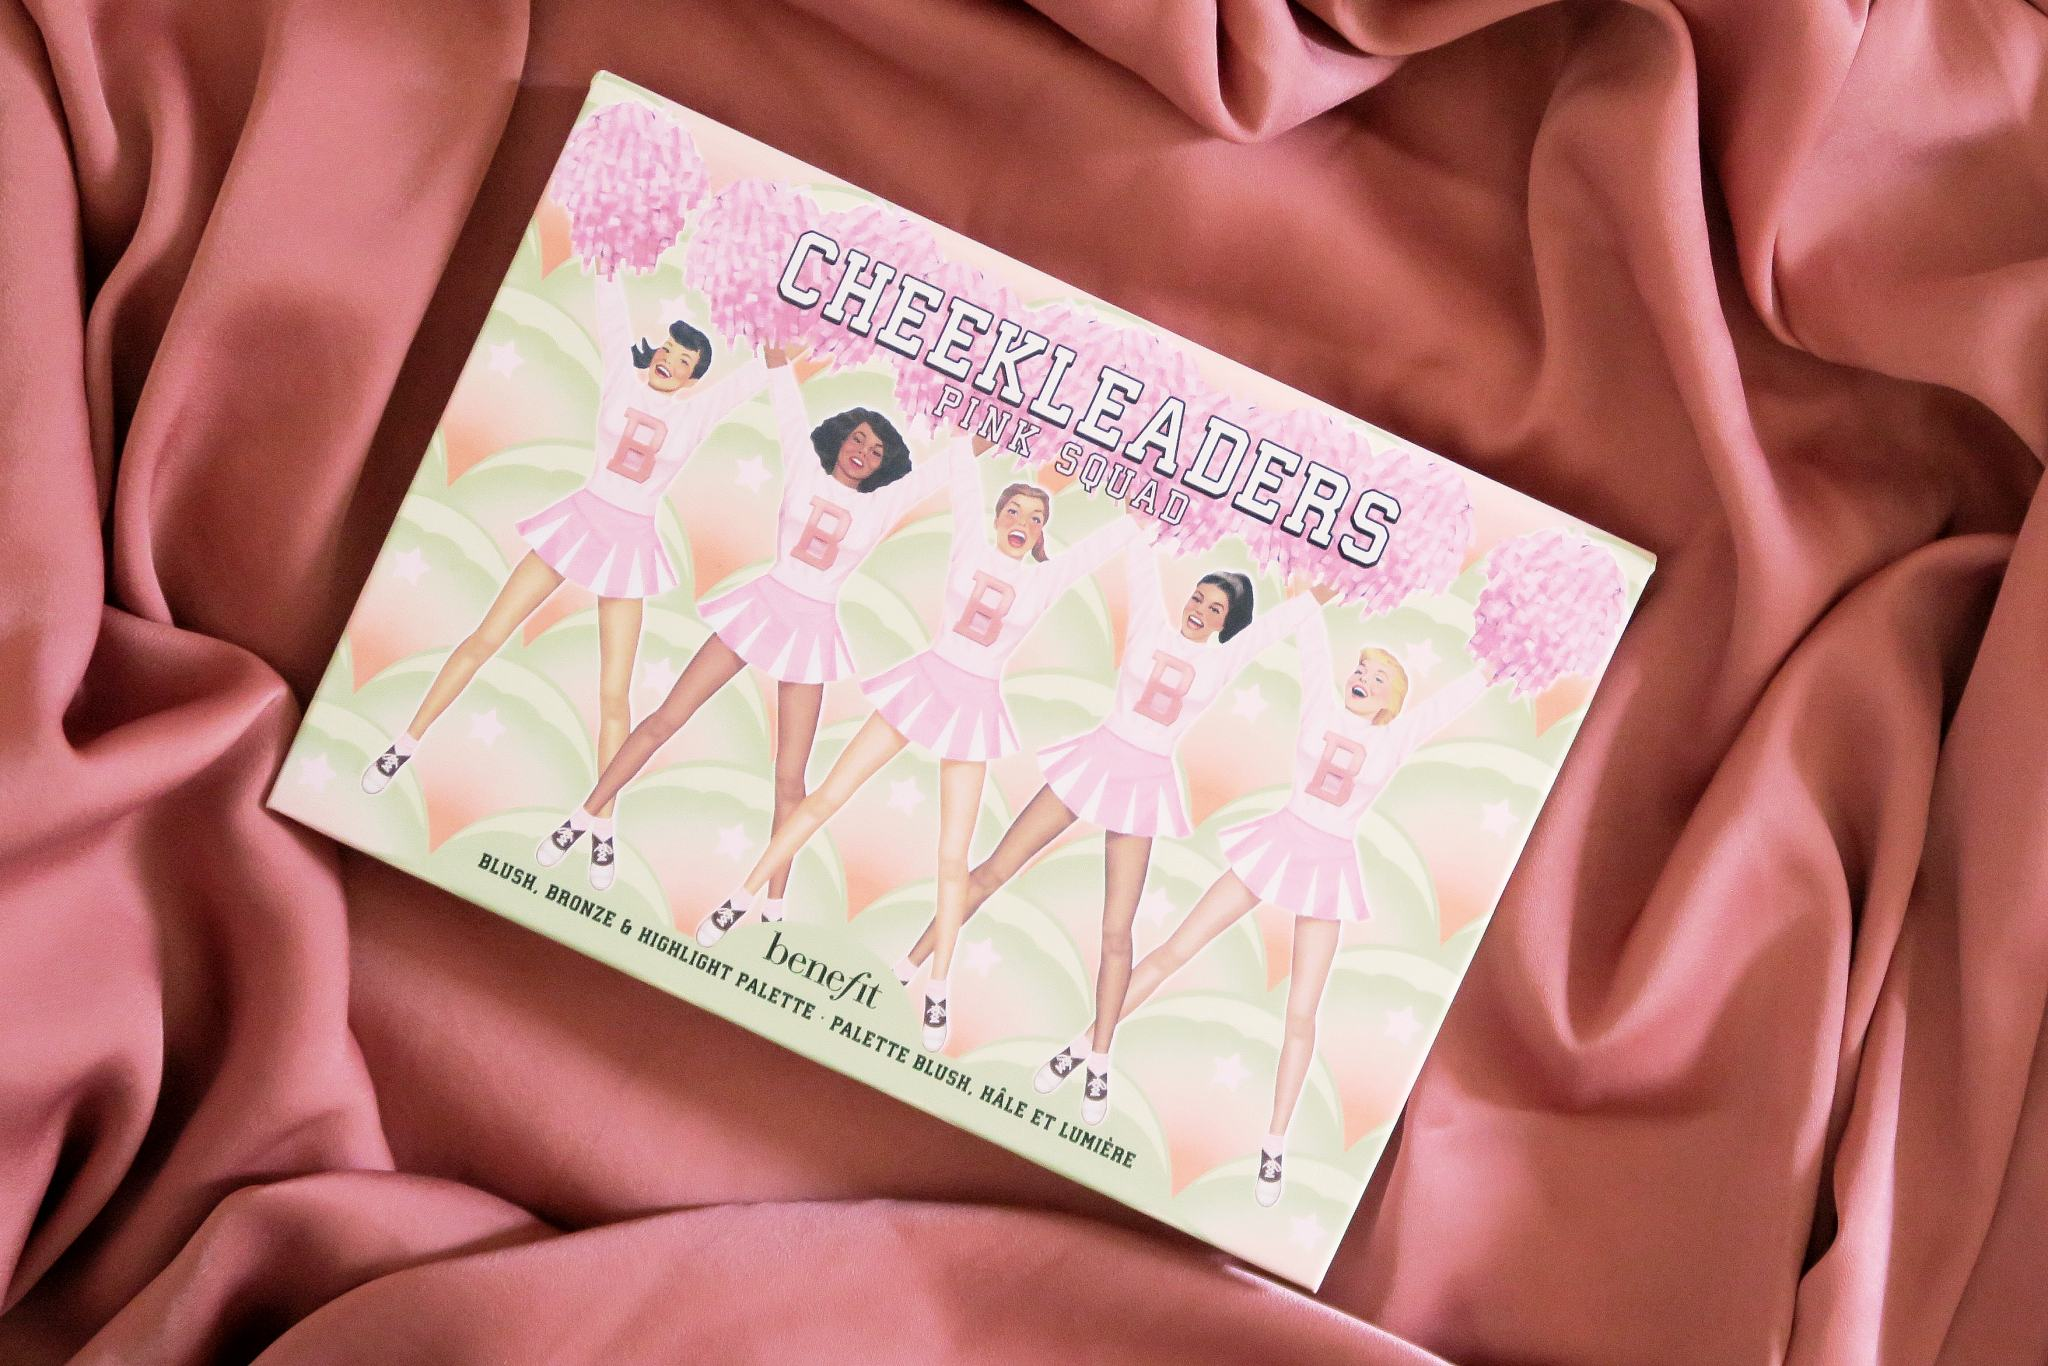 cheekleaders pink squad benefit